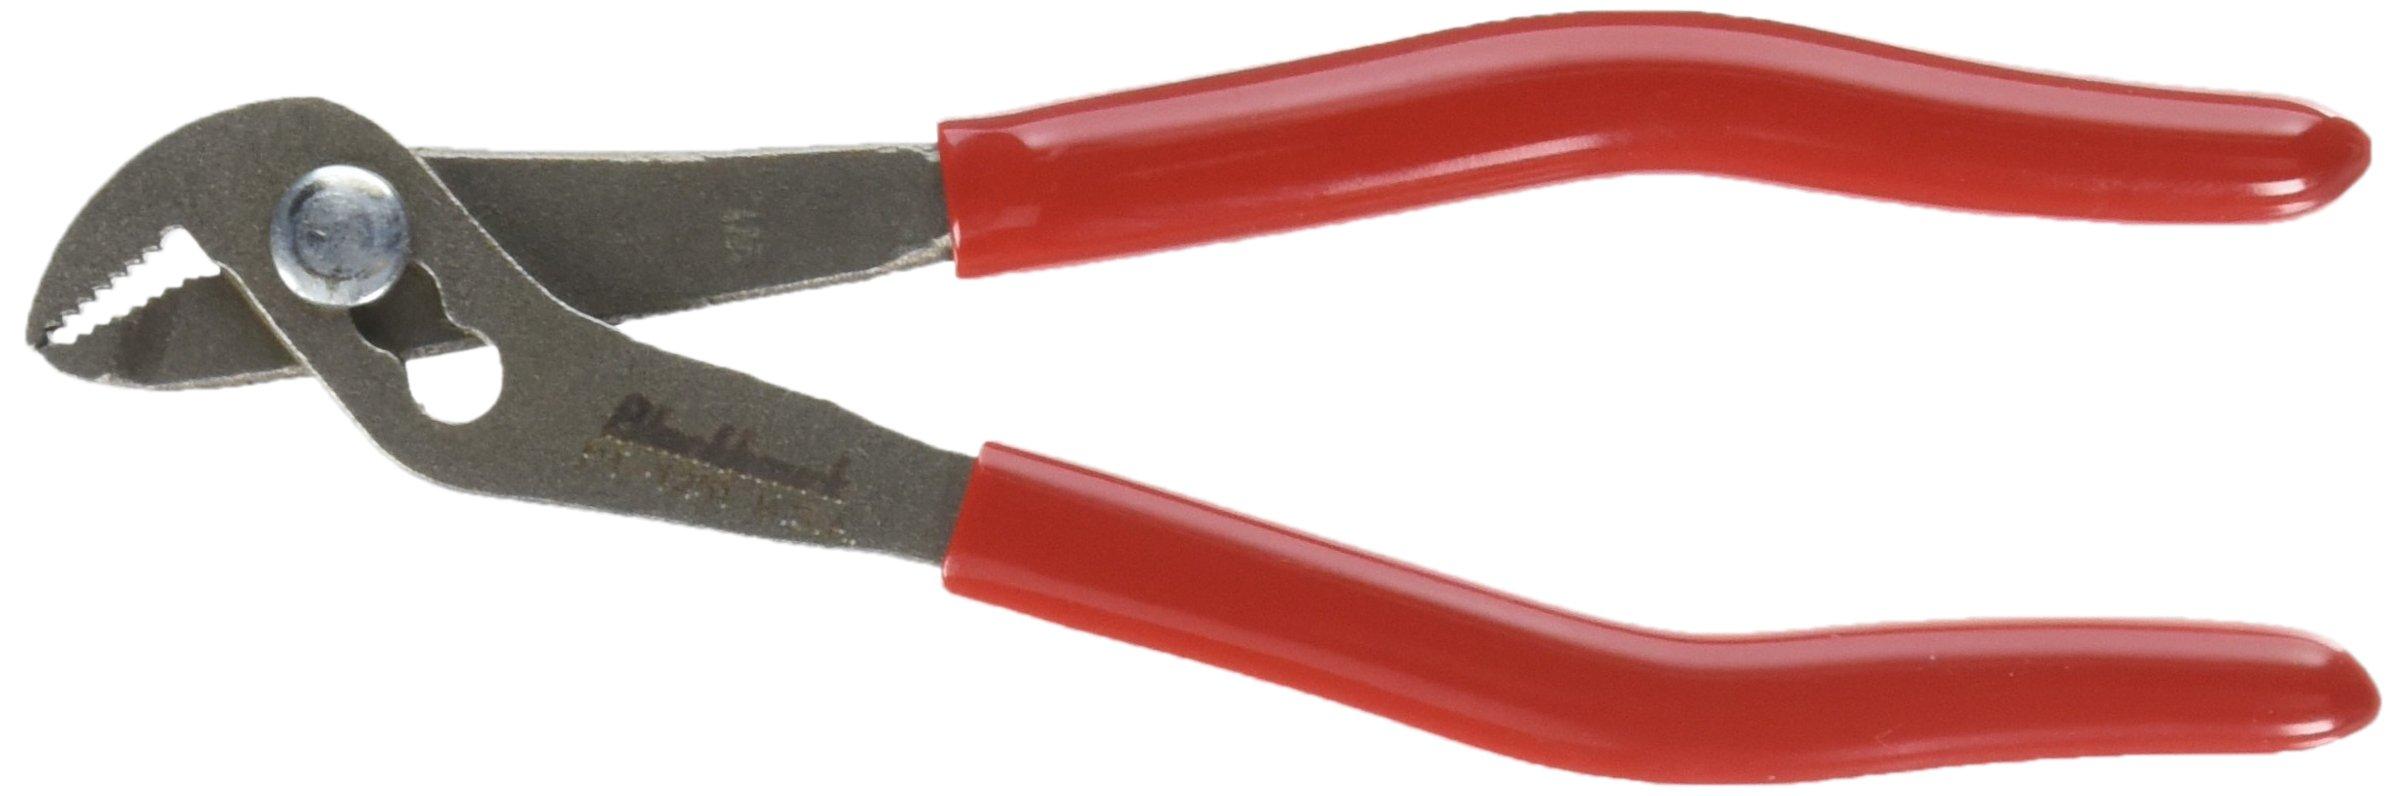 Blackhawk By Proto PT-1251 Ignition Plier, 5-Inch by Blackhawk By Proto